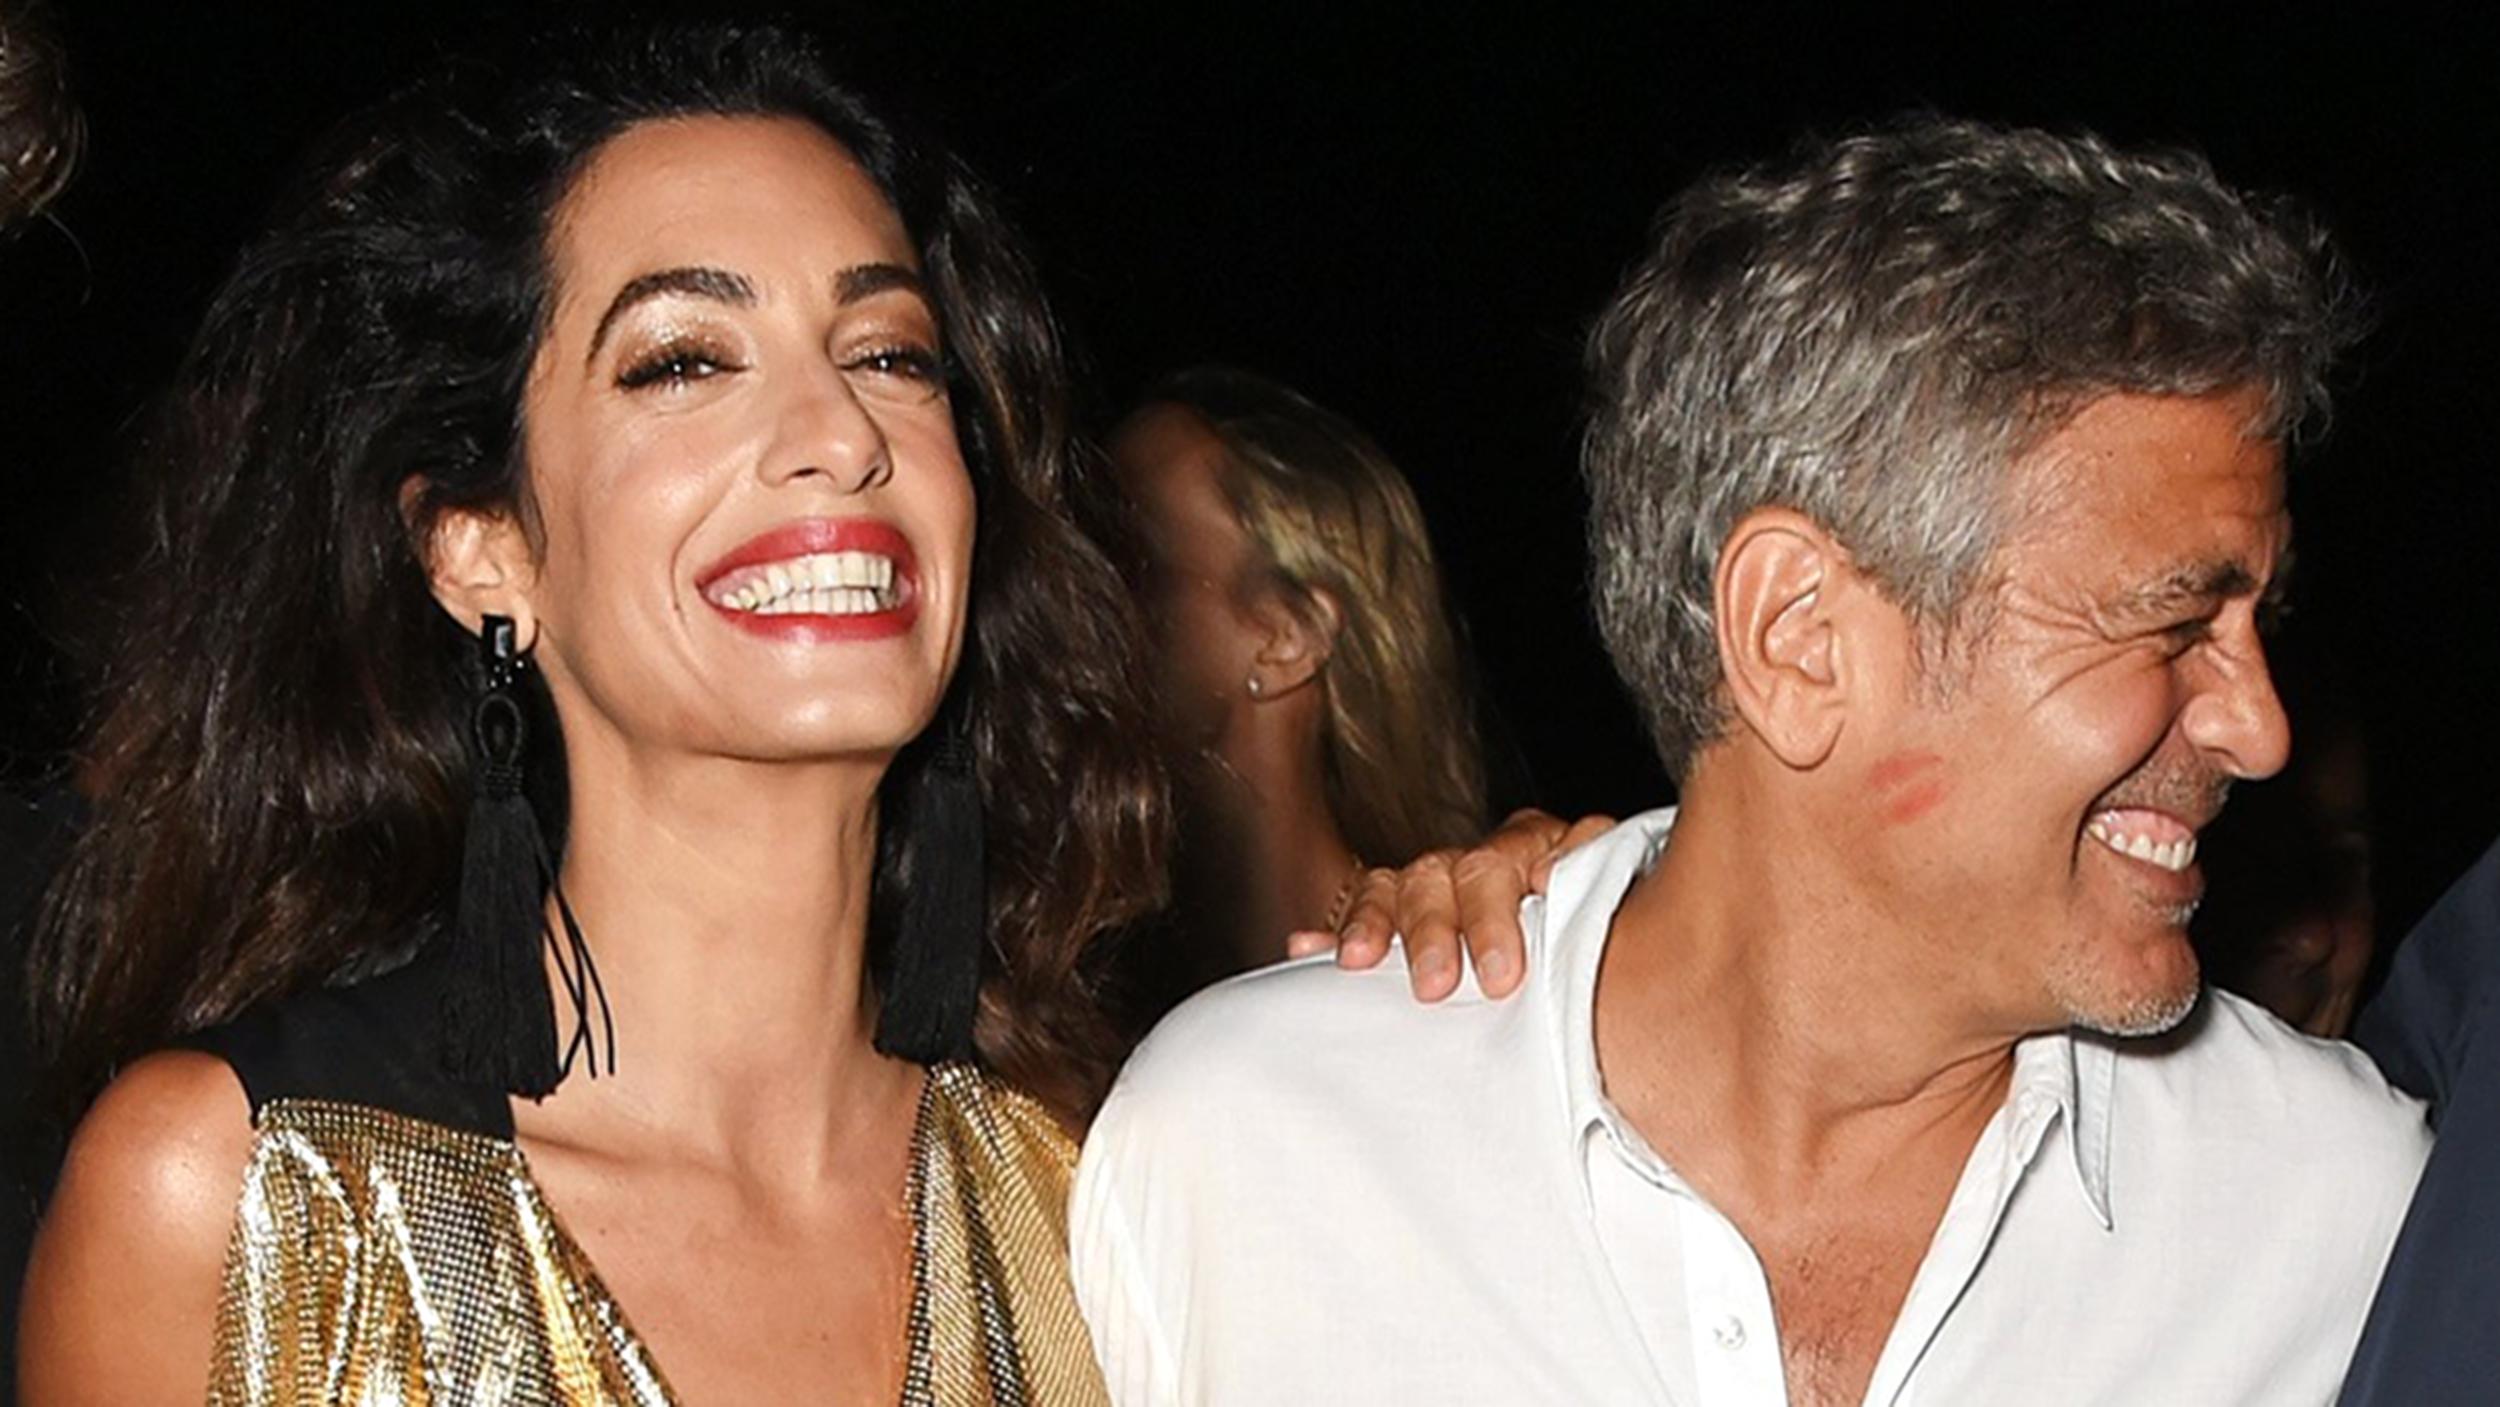 Amal Alamuddin Clooney Photos News and Videos  Just Jared